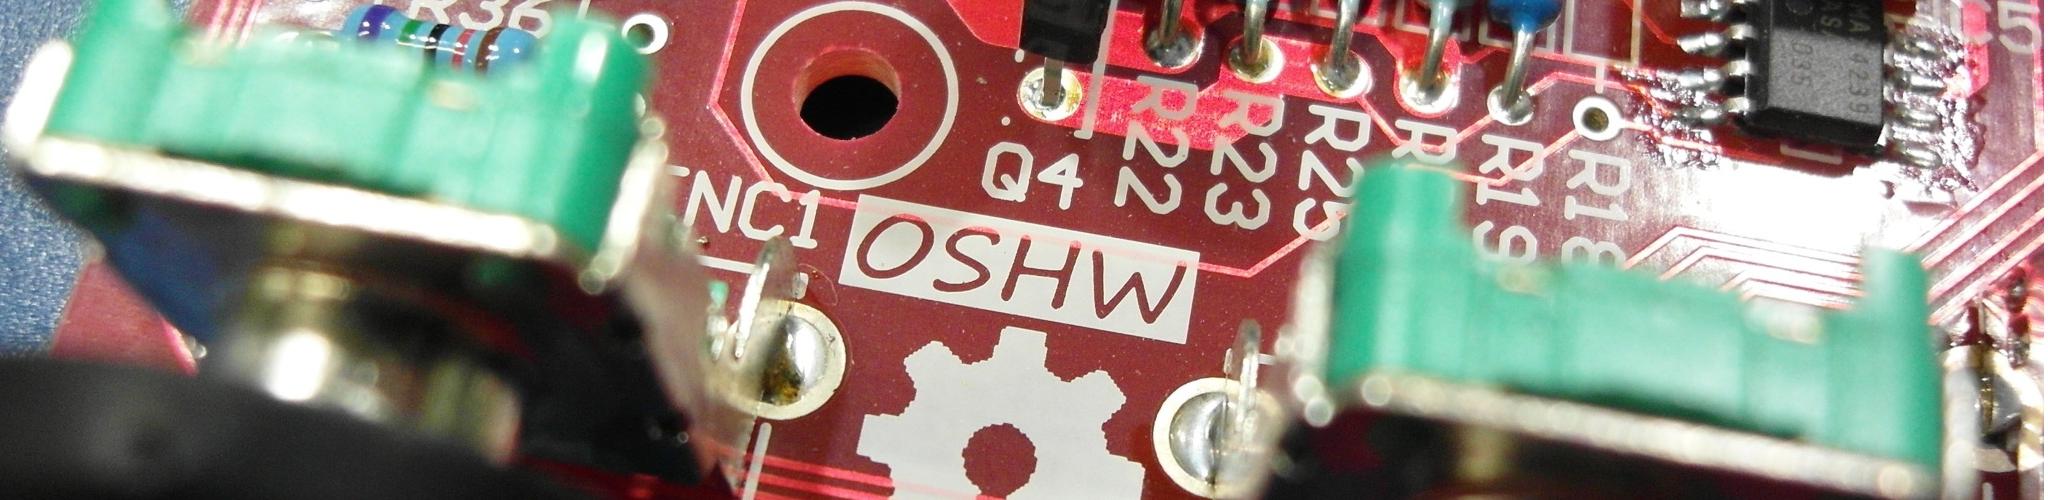 Open Source & Open Hardware